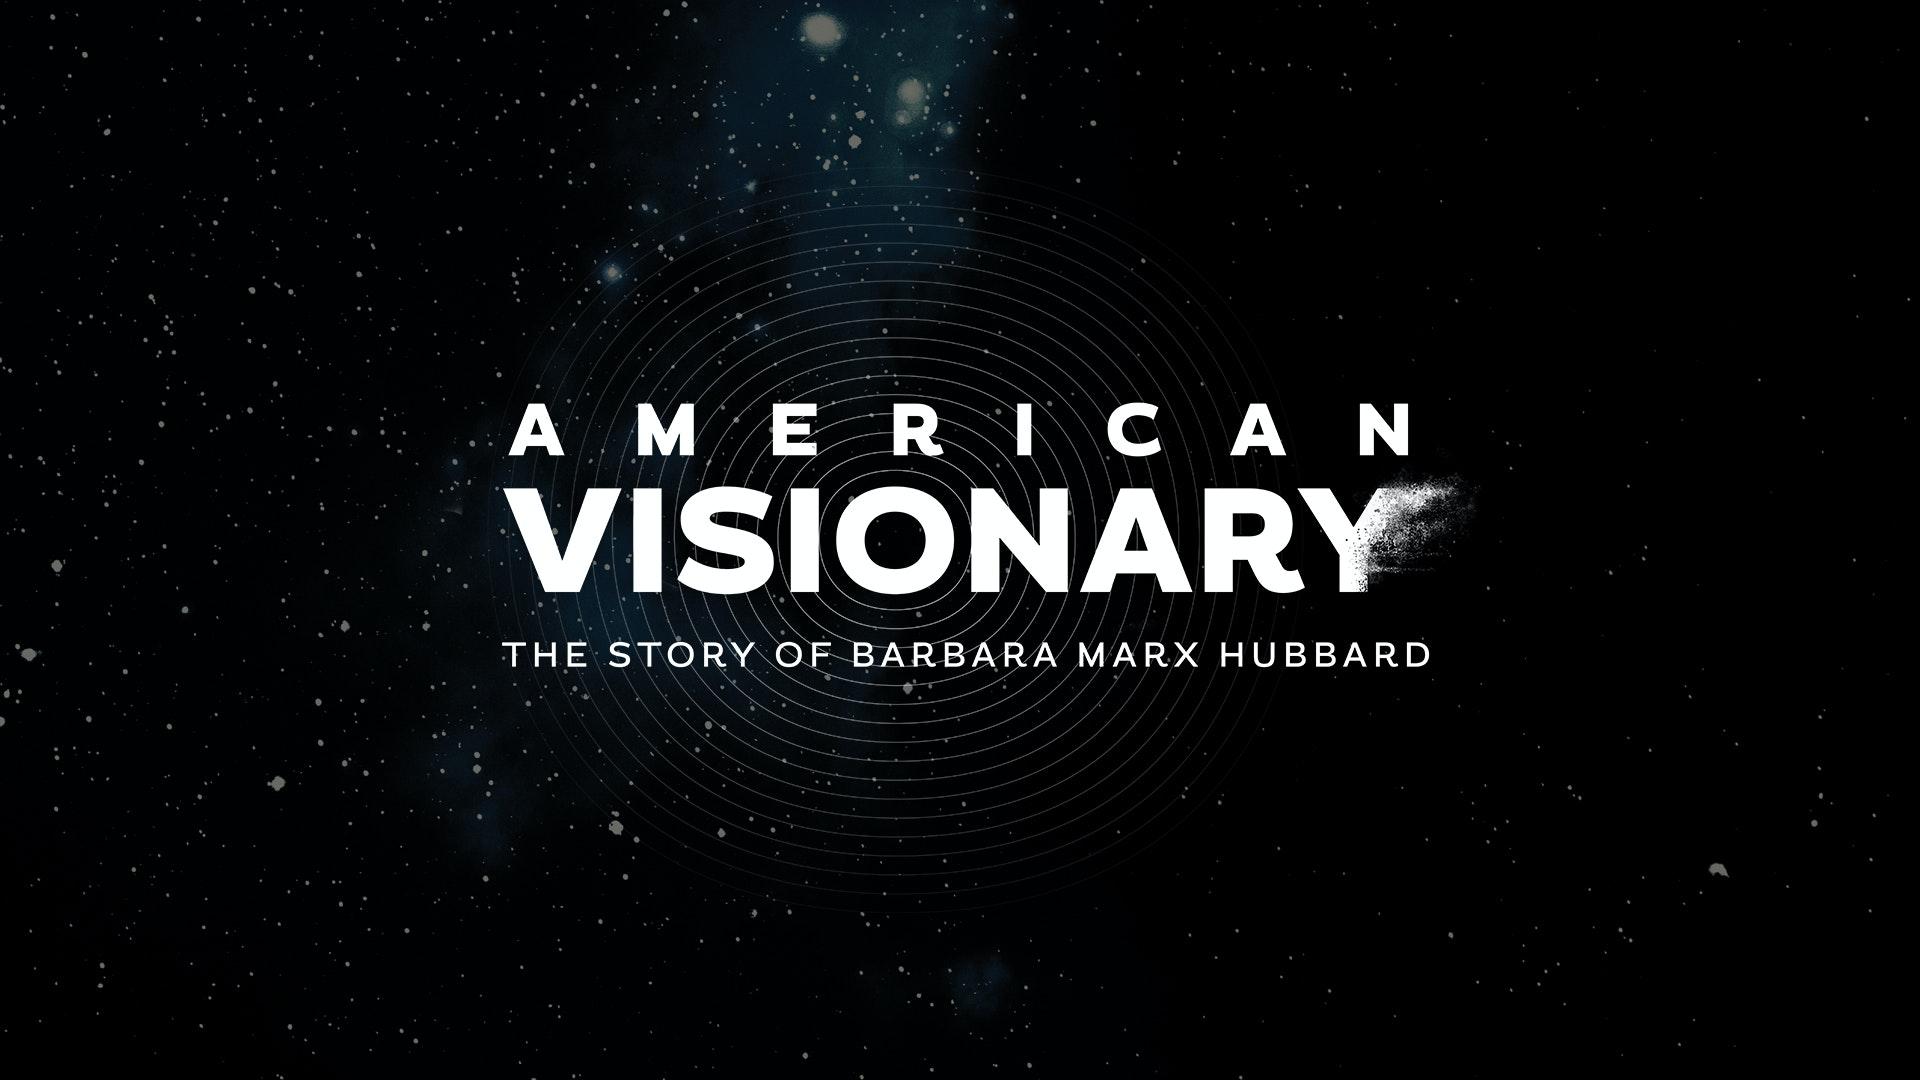 American Visionary: The Story of Barbara Marx Hubbard-Community License